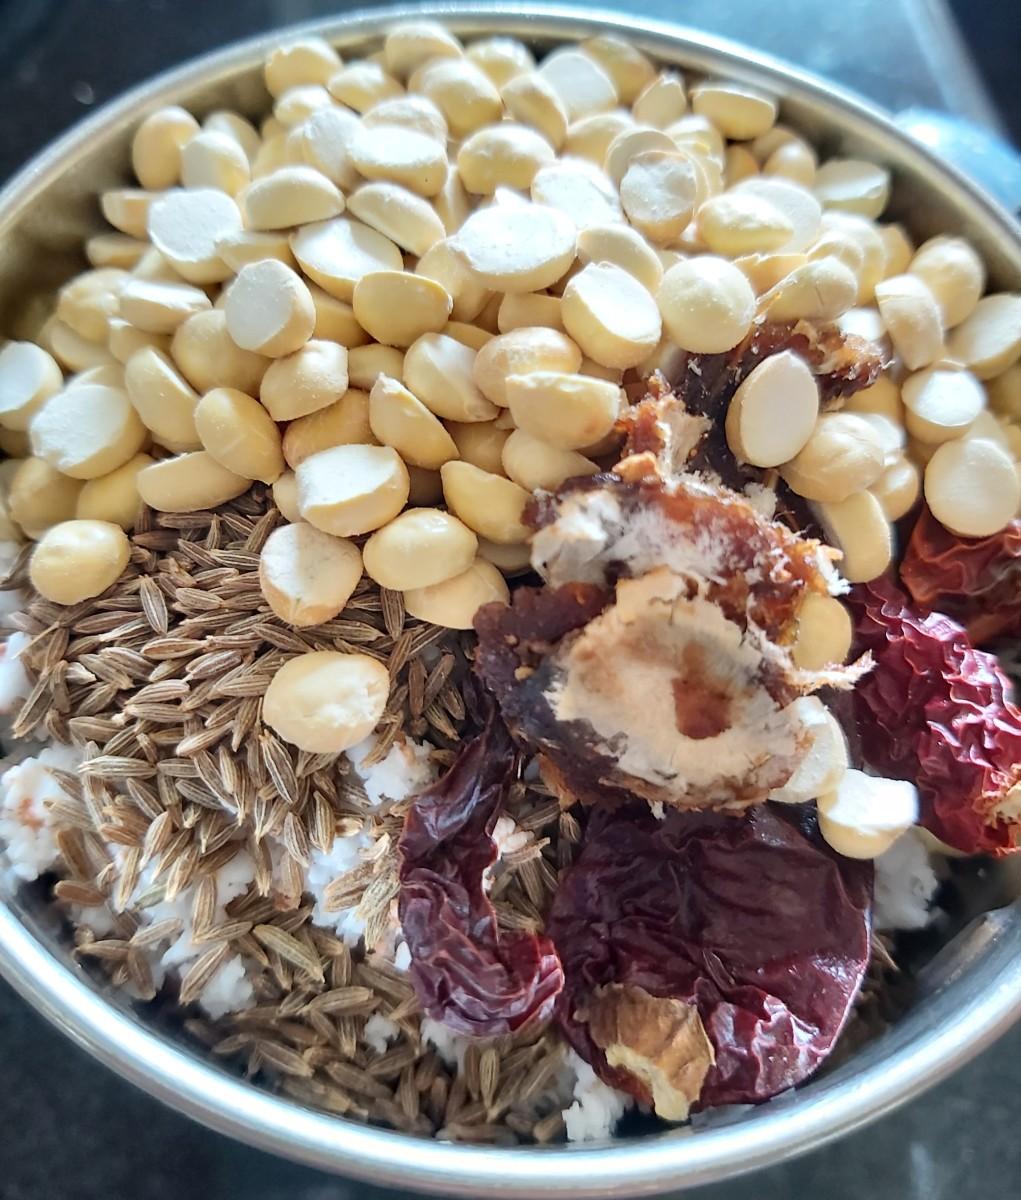 Add 2 teaspoons of cumin seeds, 1 teaspoon of tamarind pulp, 2-3 tablespoons of fried gram and 4-5 byadagi (Kashmiri red chilies).